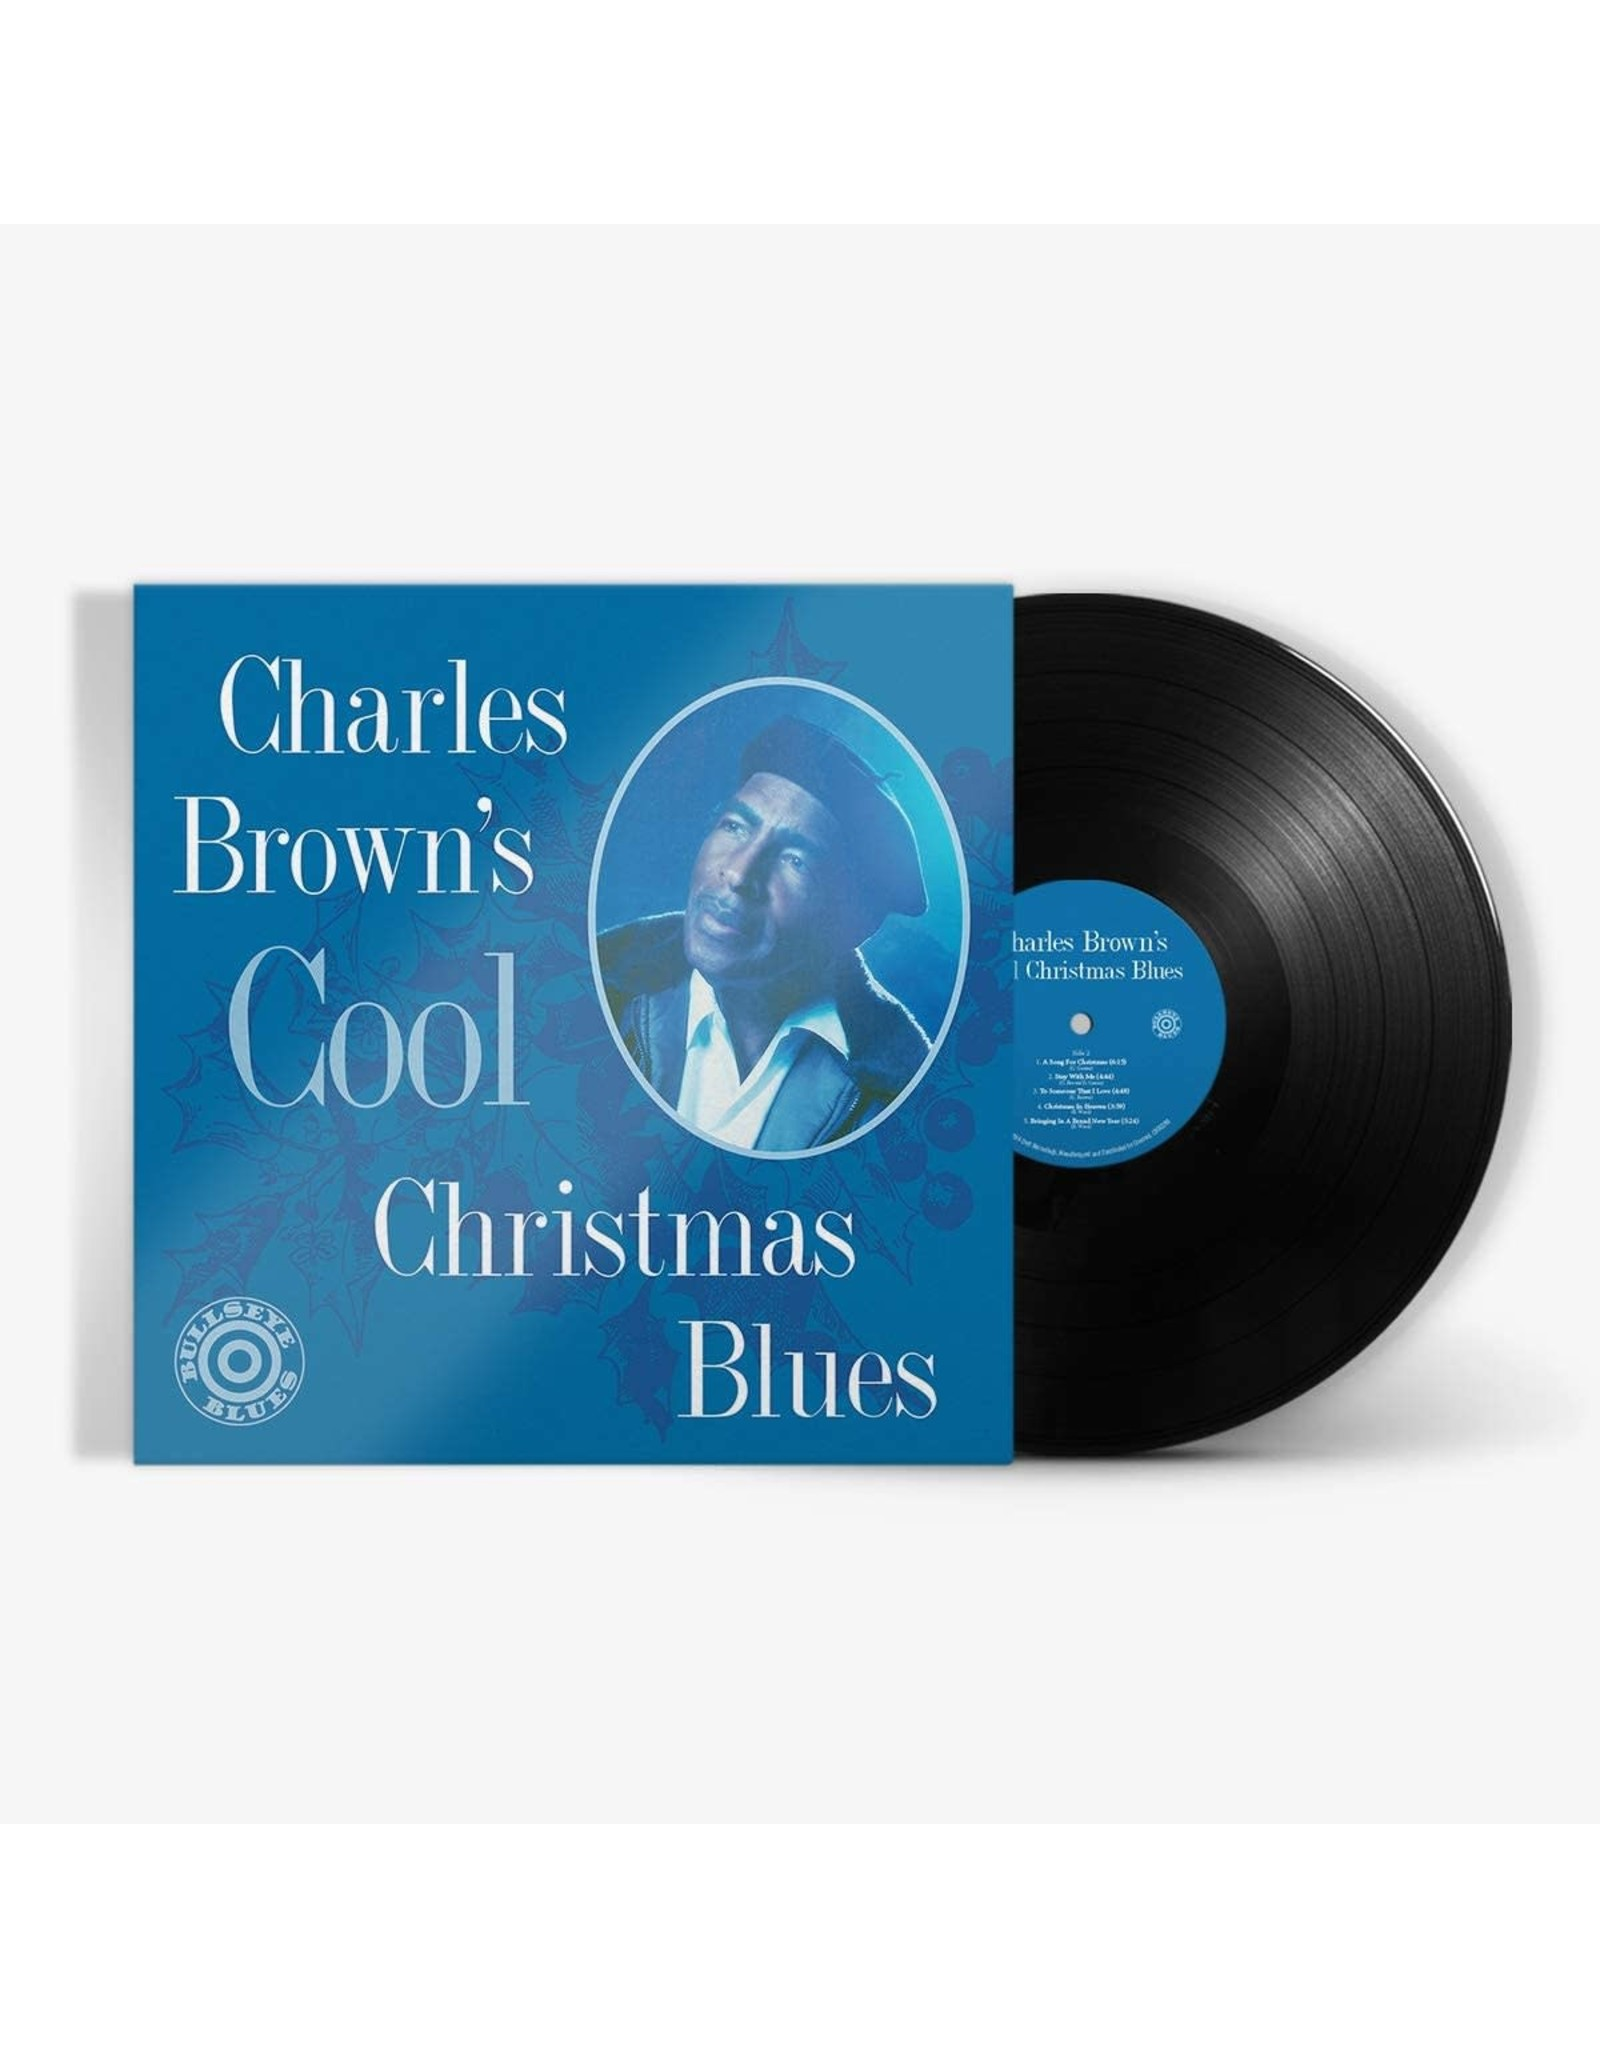 Charles Brown - Charles Brown's Cool Christmas